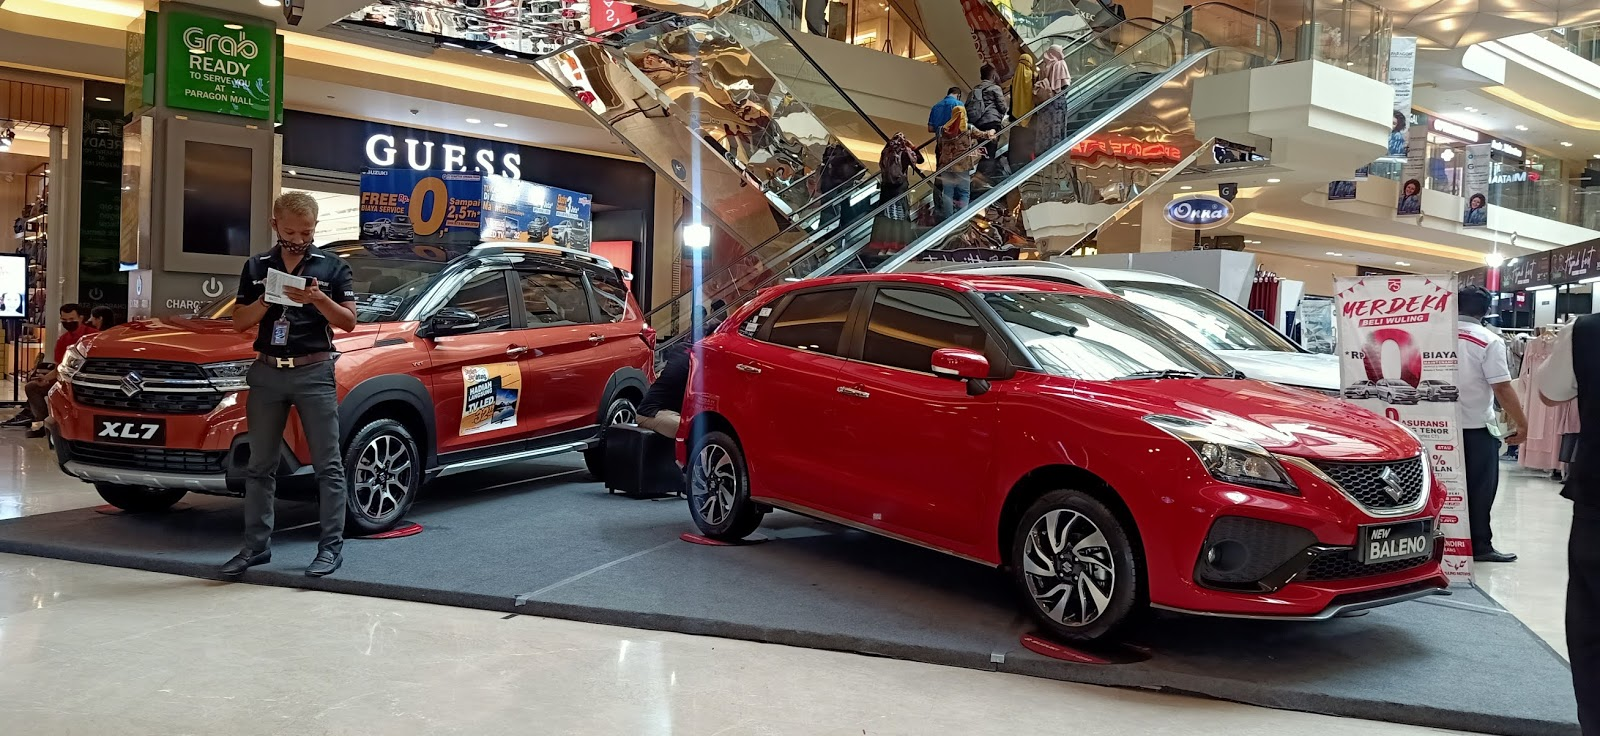 Pameran Mobil Suzuki Paragon Mall